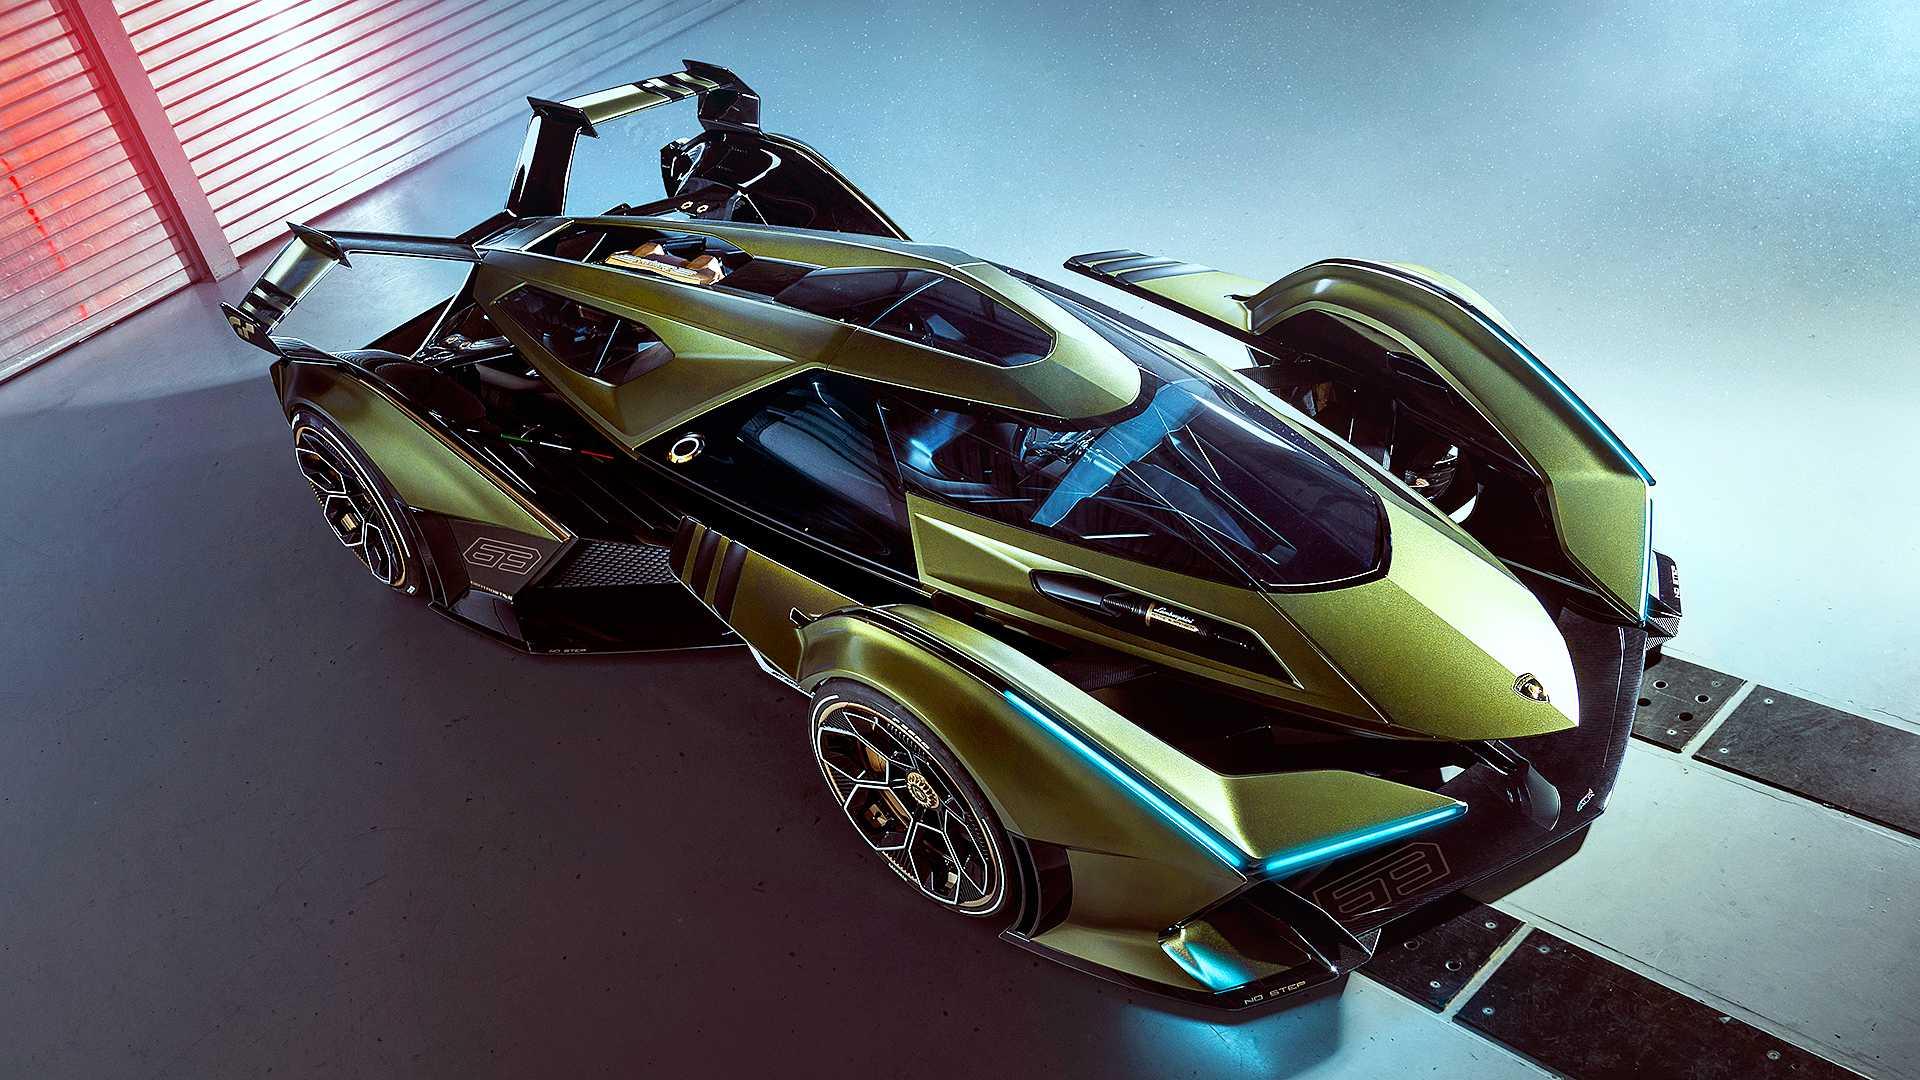 Lamborghini-V12-Vision-Gran-Turismo-8